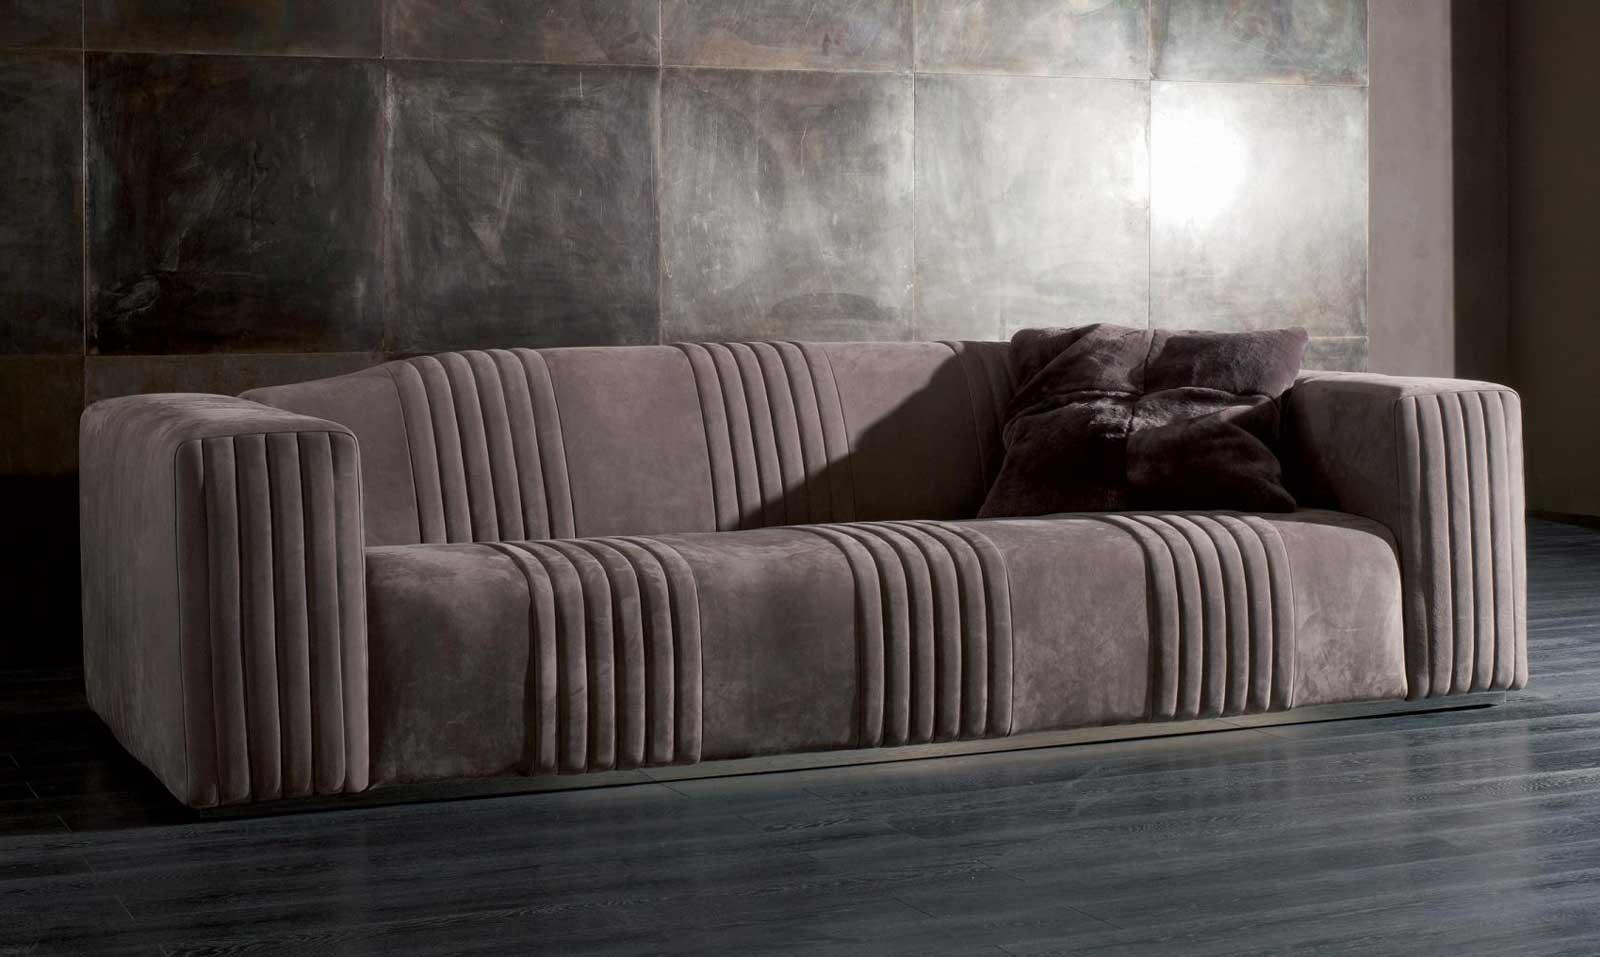 chaise lounge sofa loungembel fr balkon einige tolle. Black Bedroom Furniture Sets. Home Design Ideas